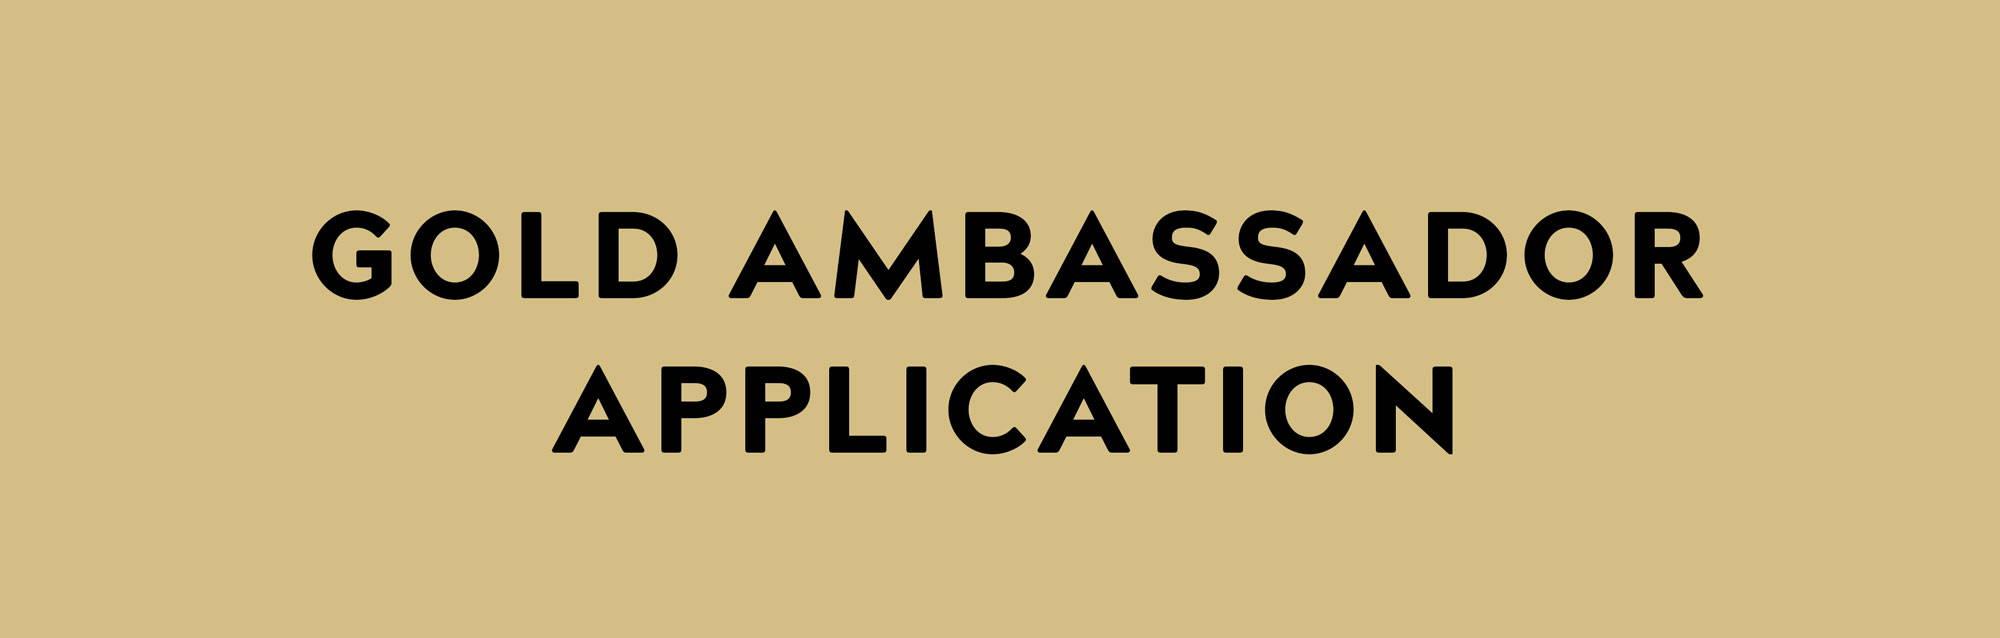 LOCTOTE gold ambassador application page